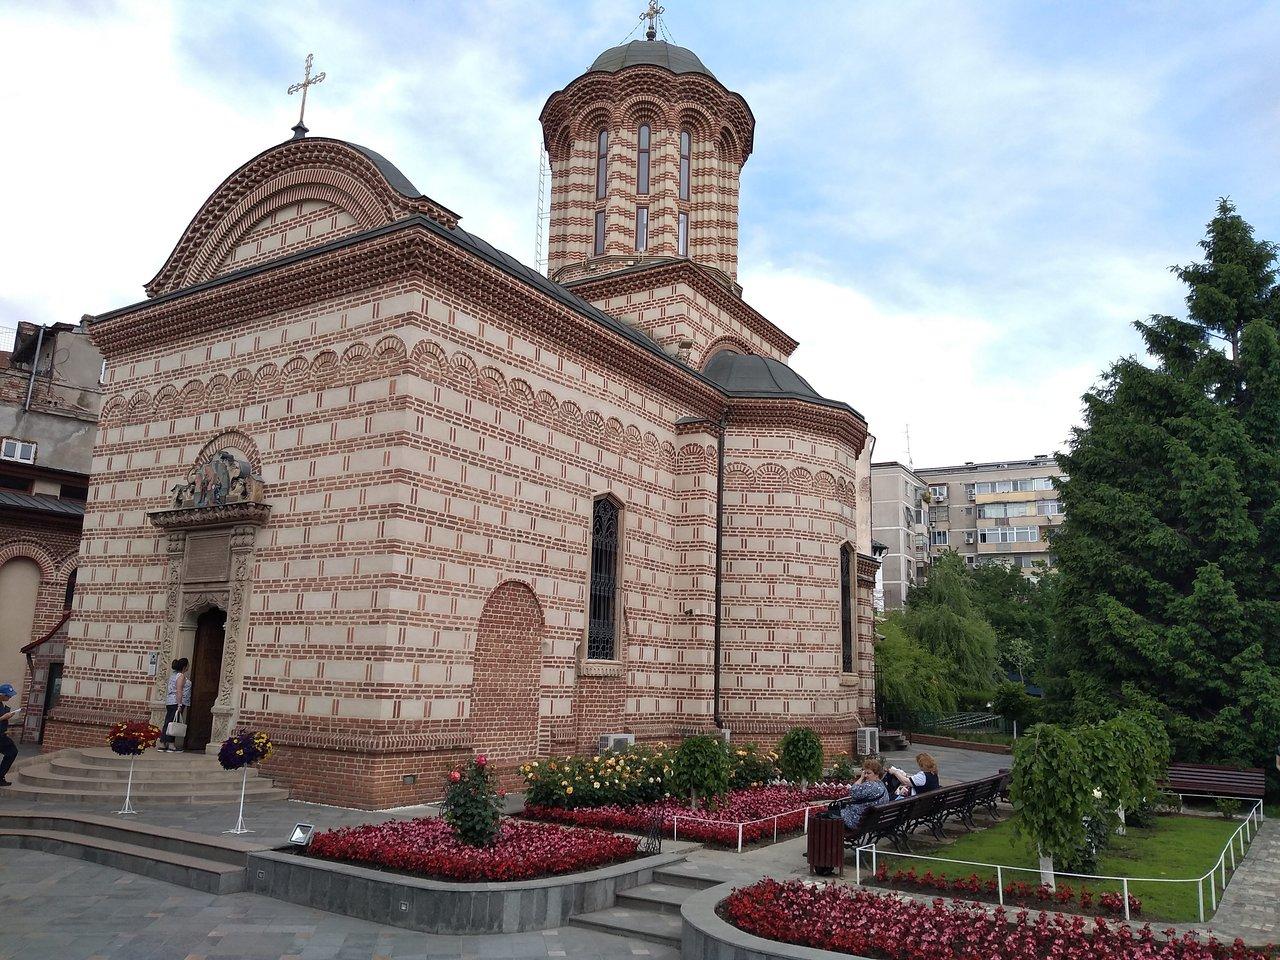 Biserica Sfantul Anton Curtea Veche Bucharest Tripadvisor